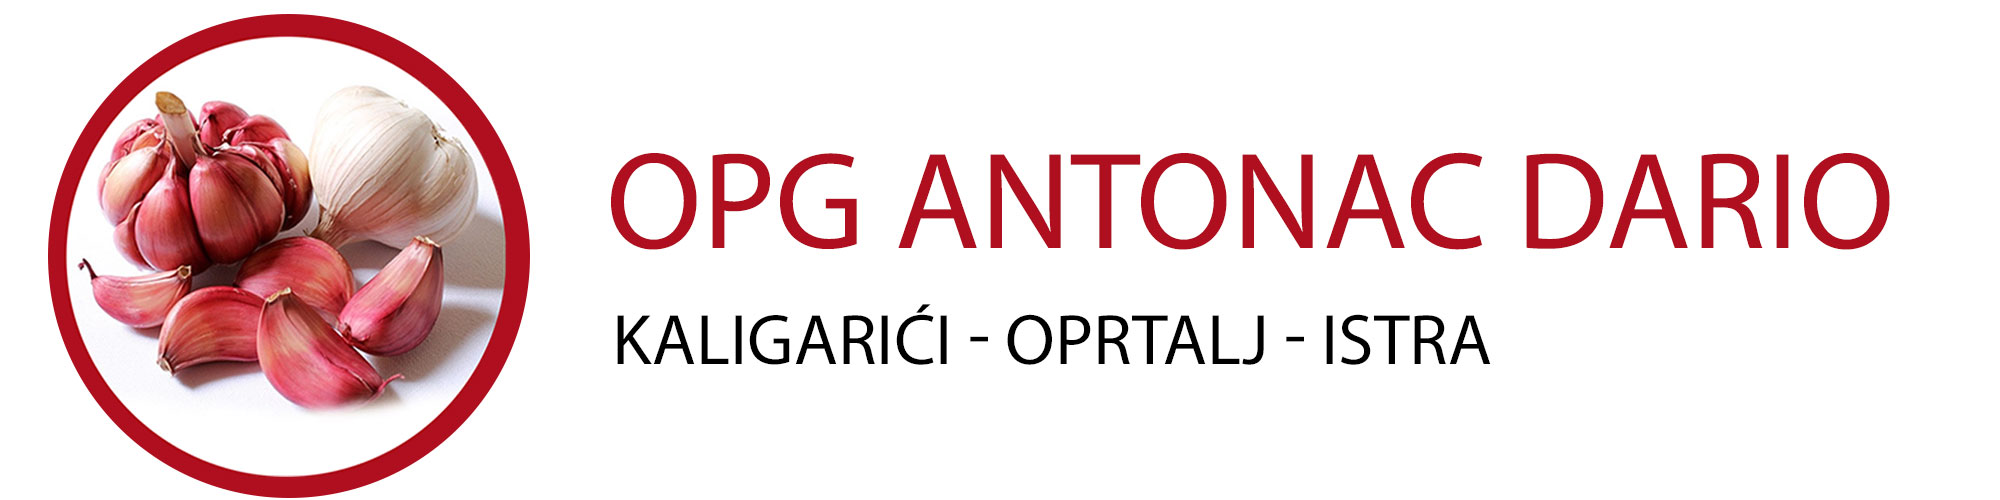 LOGO-STICKY-OPG-DARIO-ANTONAC